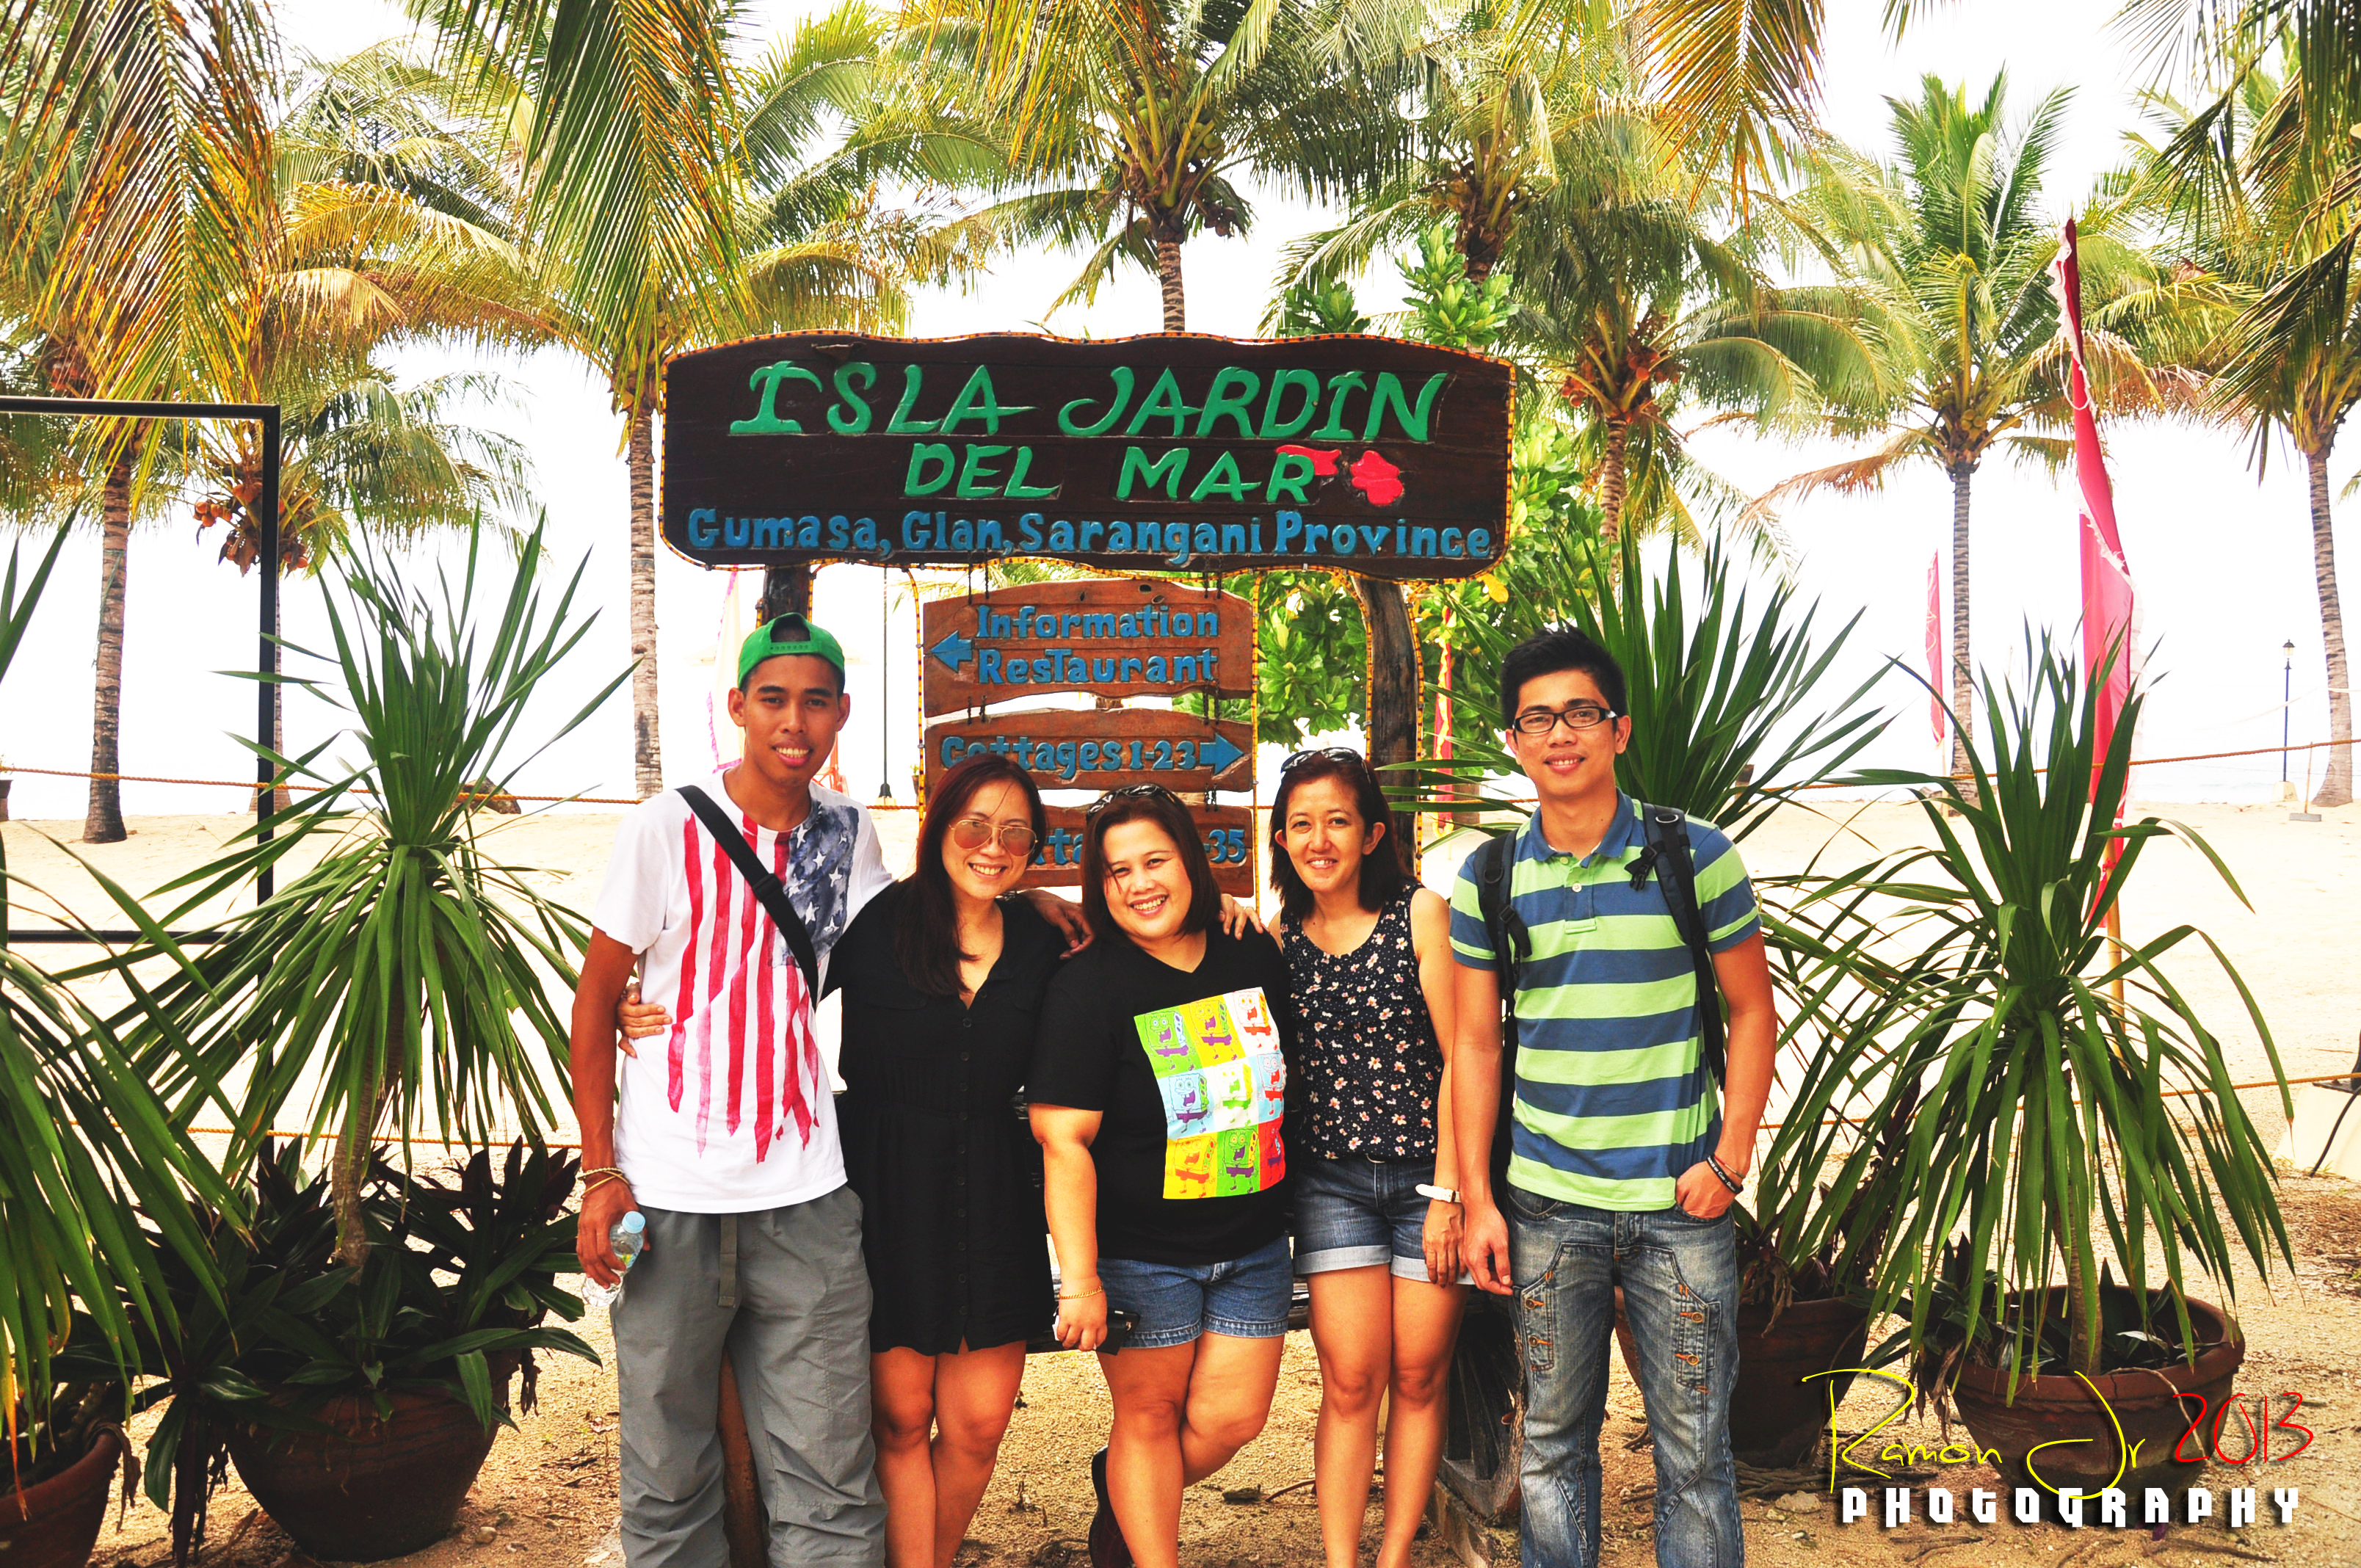 Isla jardin del mar lakwatserong sulit for Casas jardin del mar